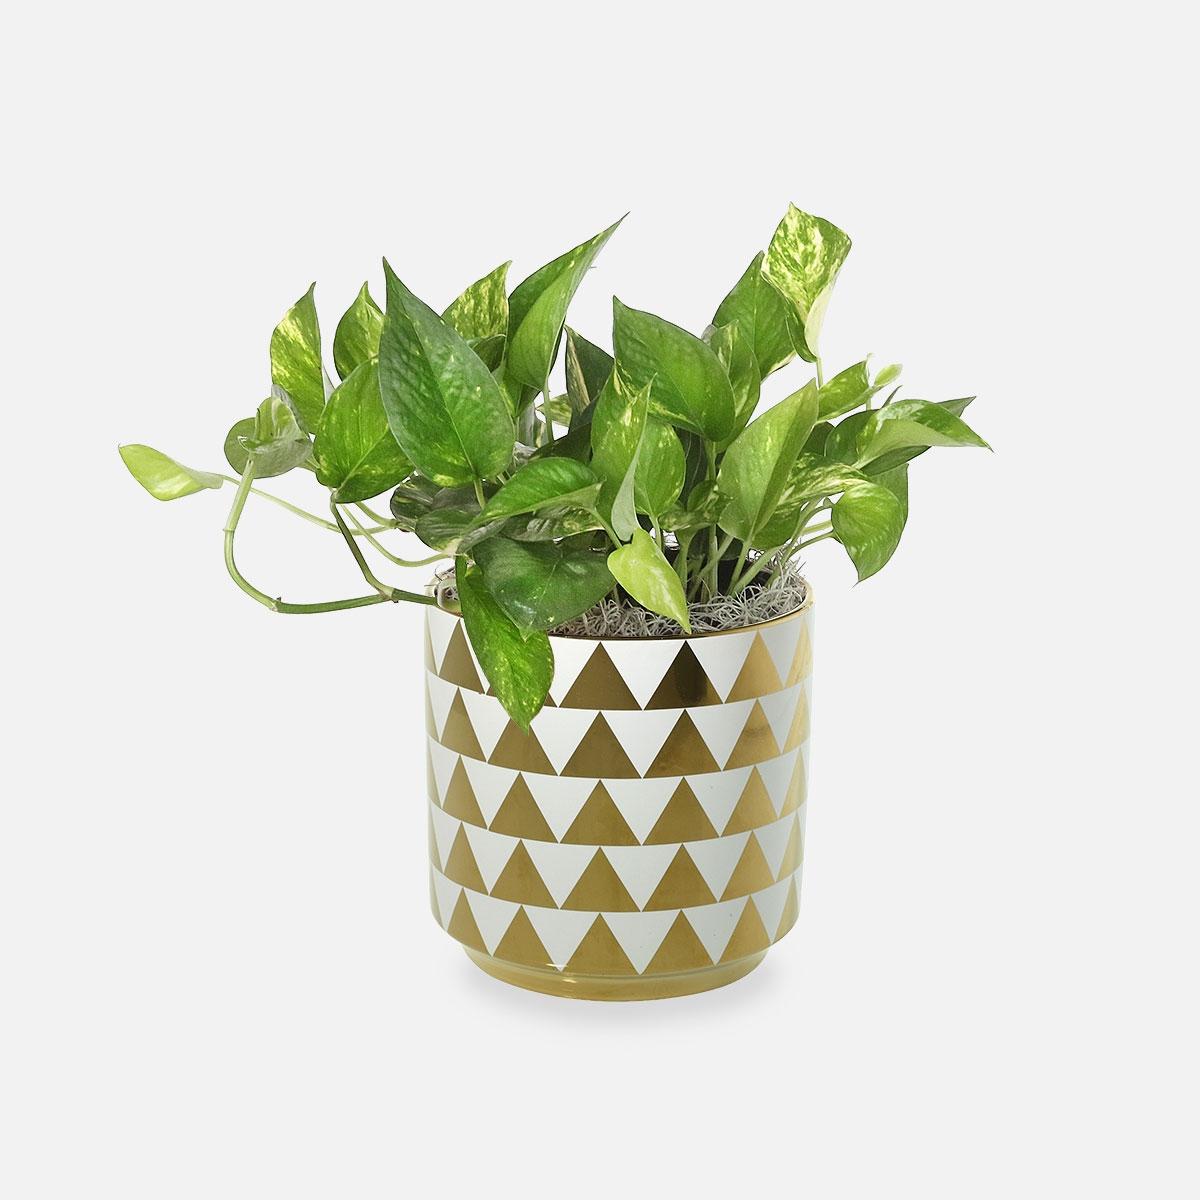 Golden Pothos in Spade Pot by Plantshed